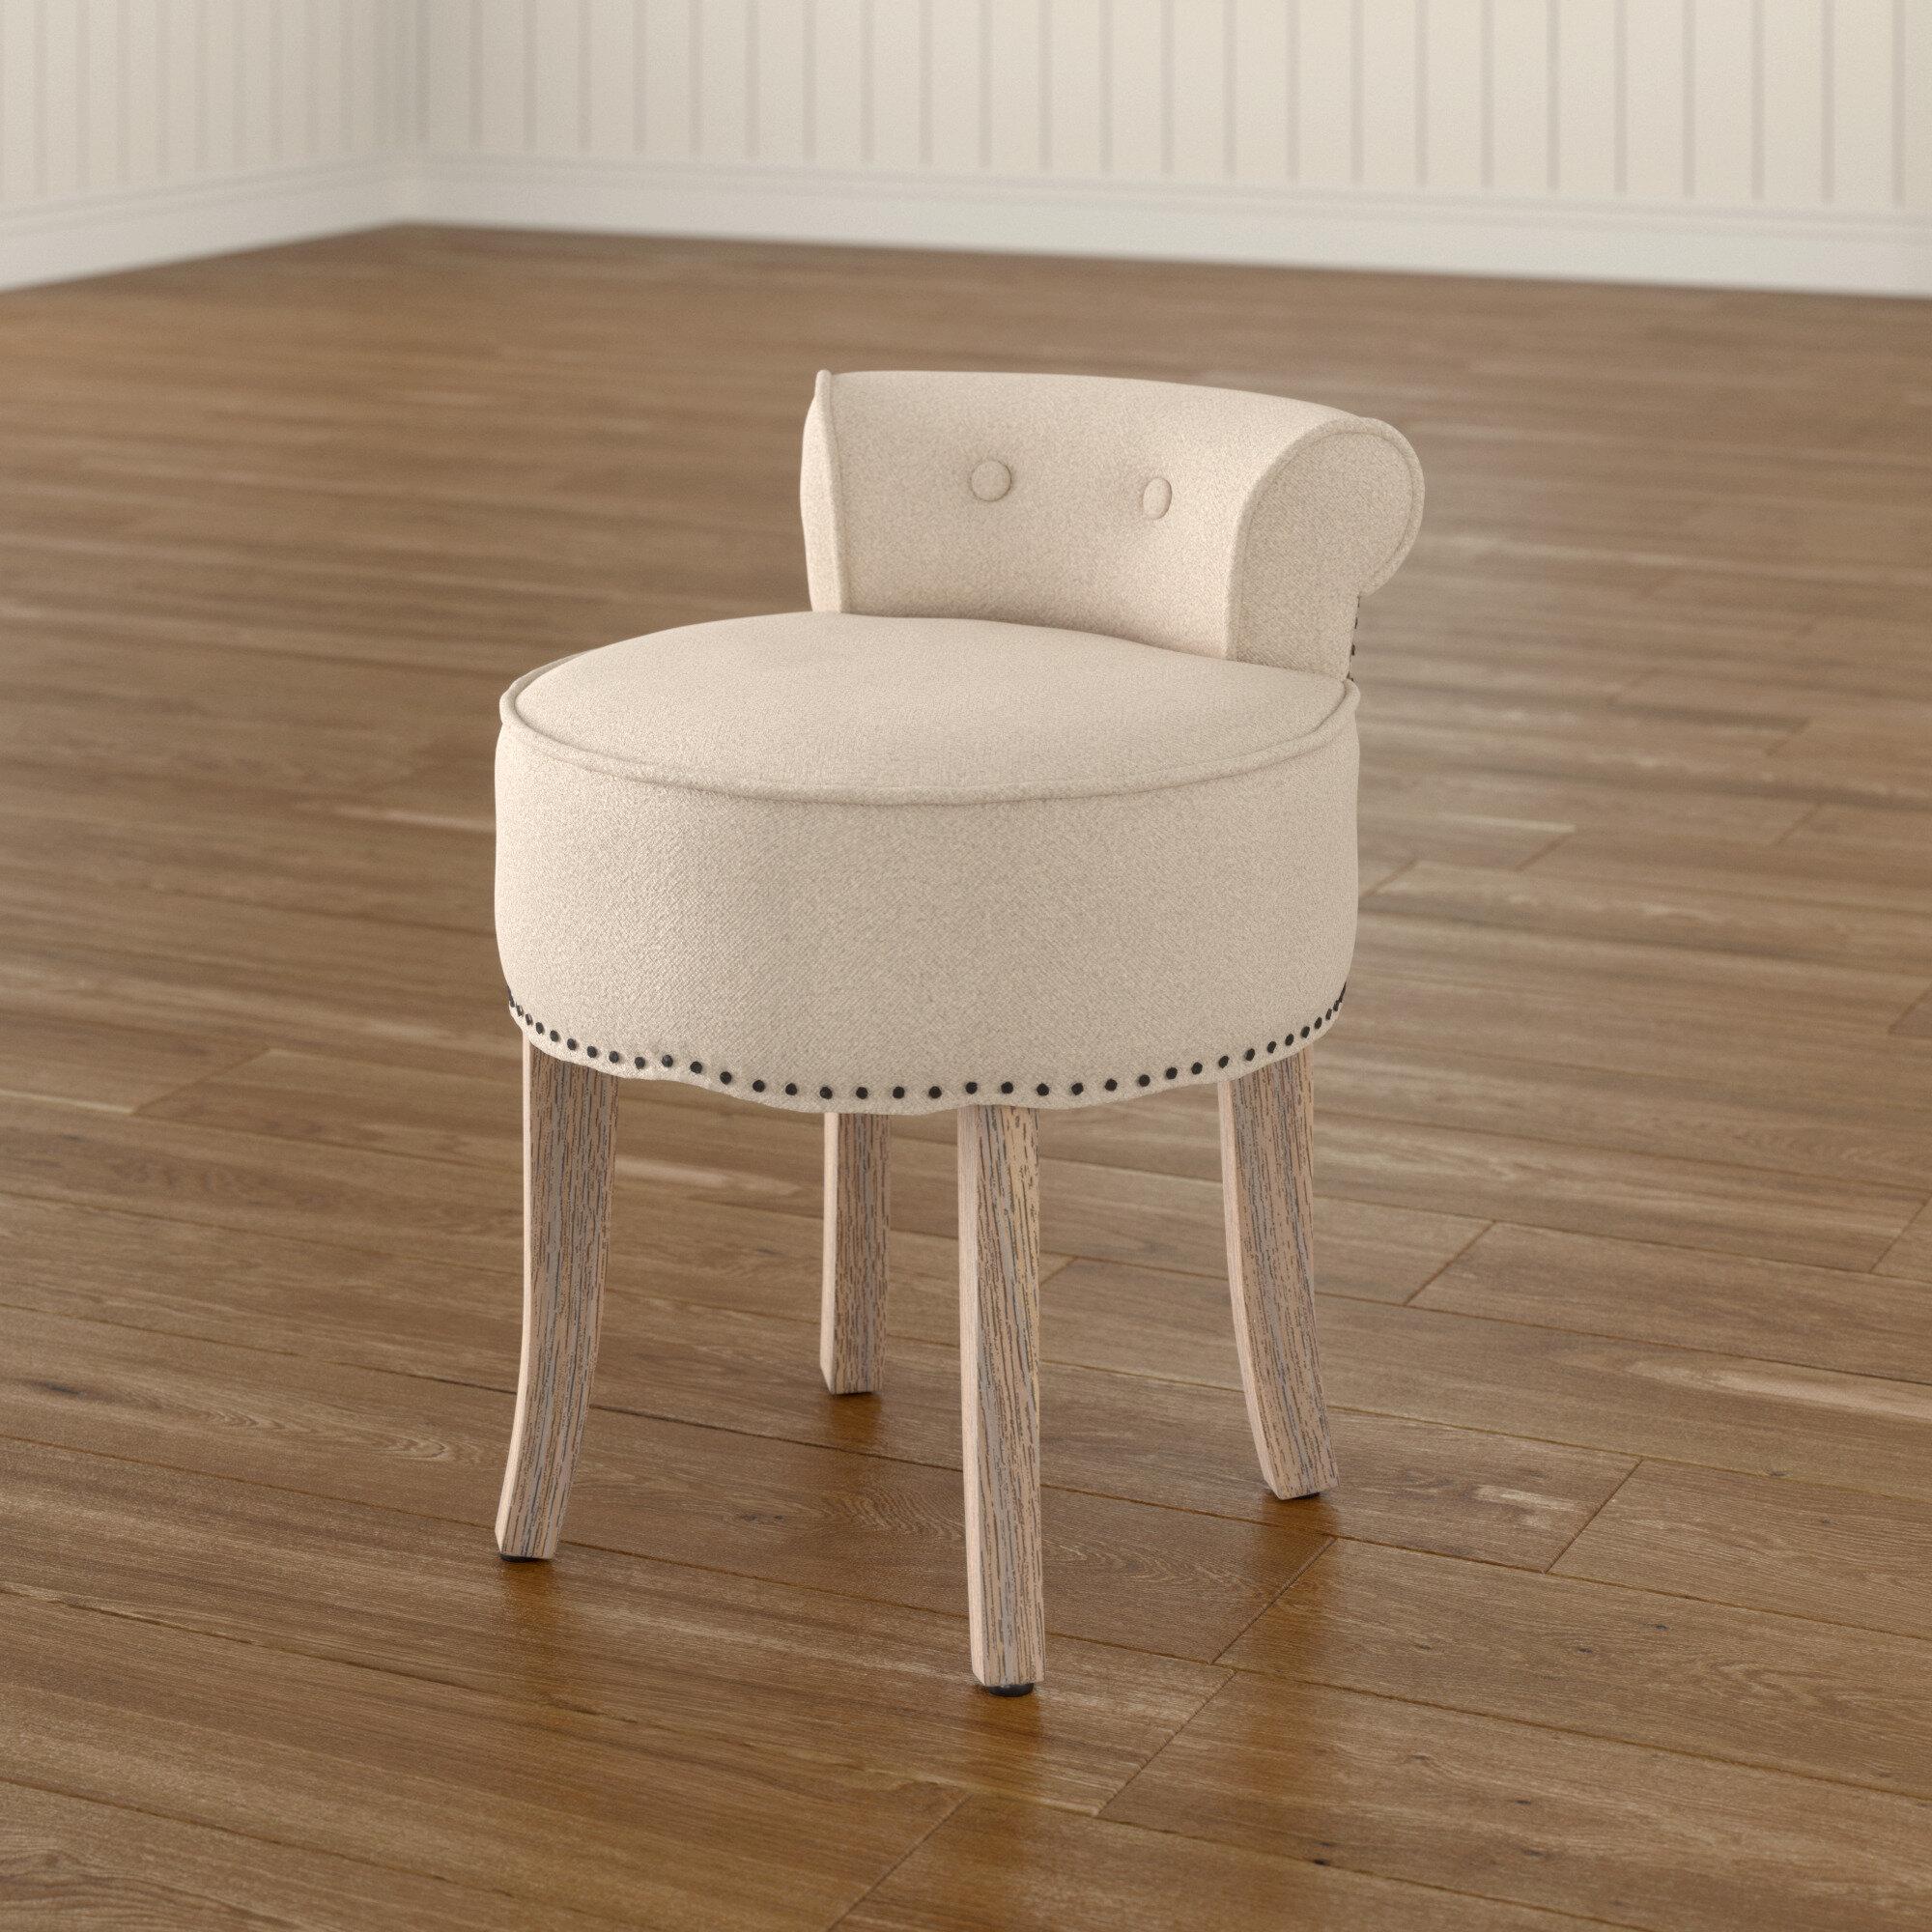 Excellent Lark Manor Charly Vanity Stool Reviews Wayfair Ncnpc Chair Design For Home Ncnpcorg